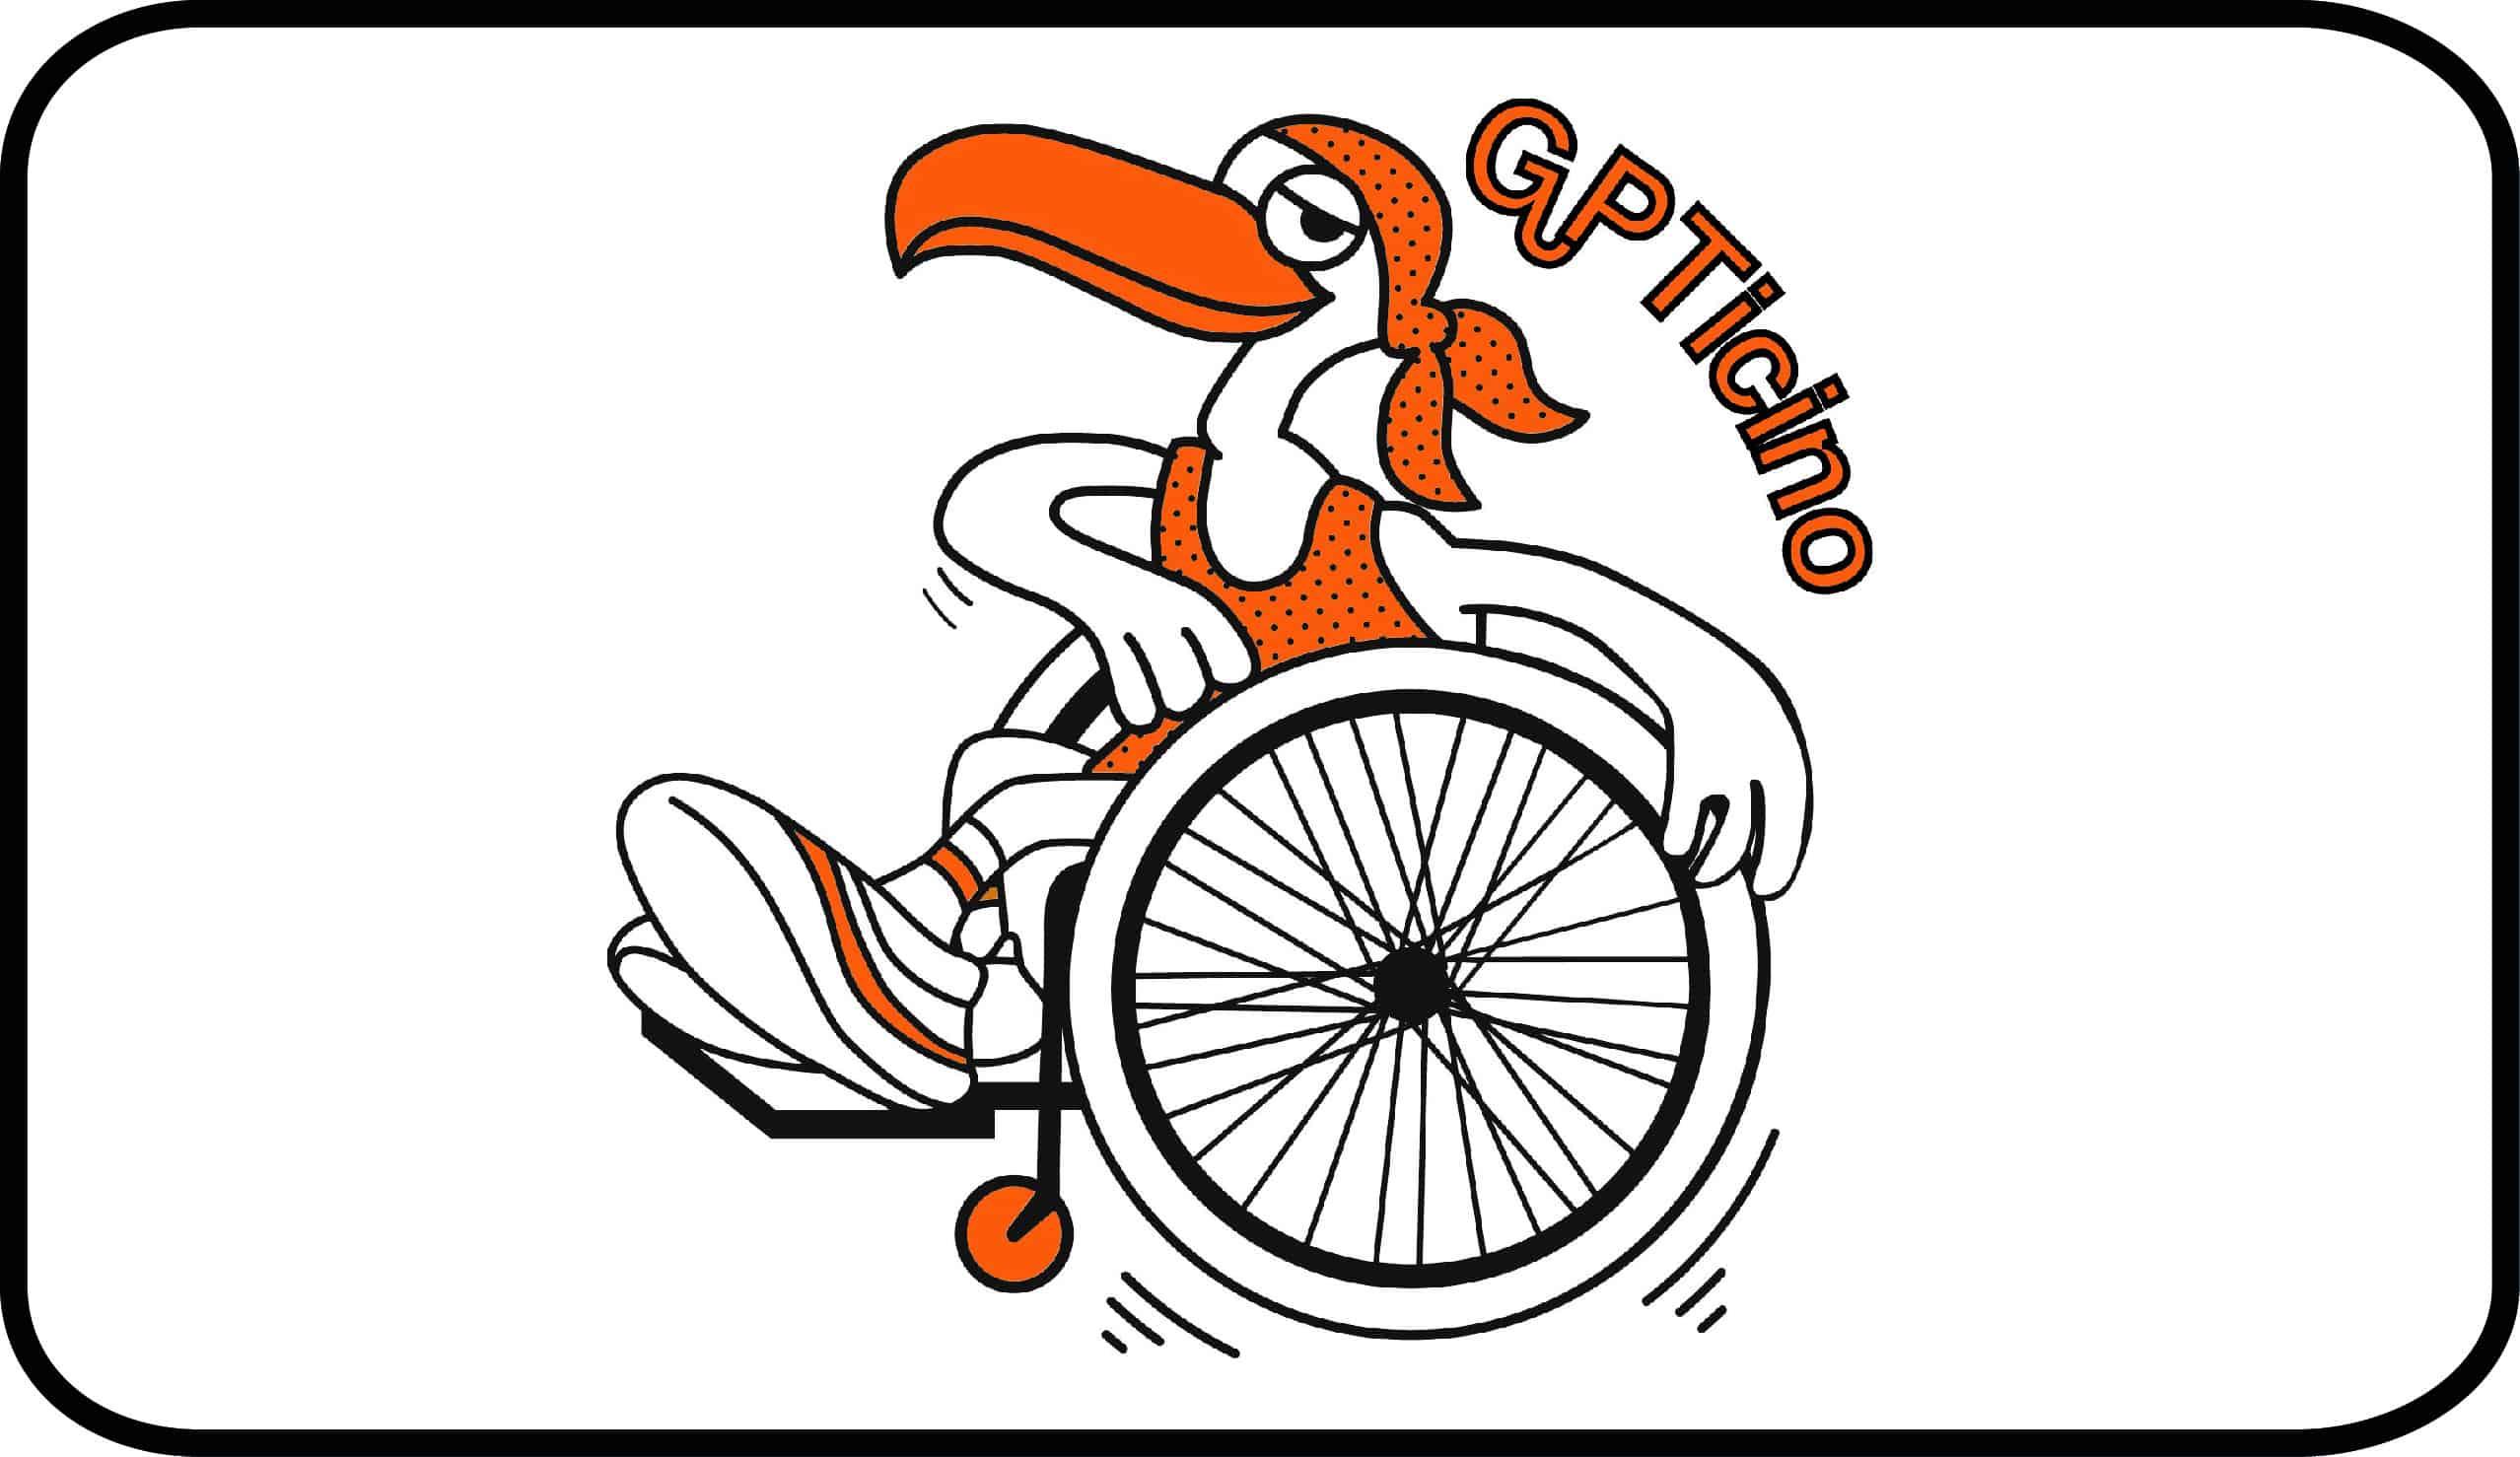 GPT gruppo paraplegici ticino logo